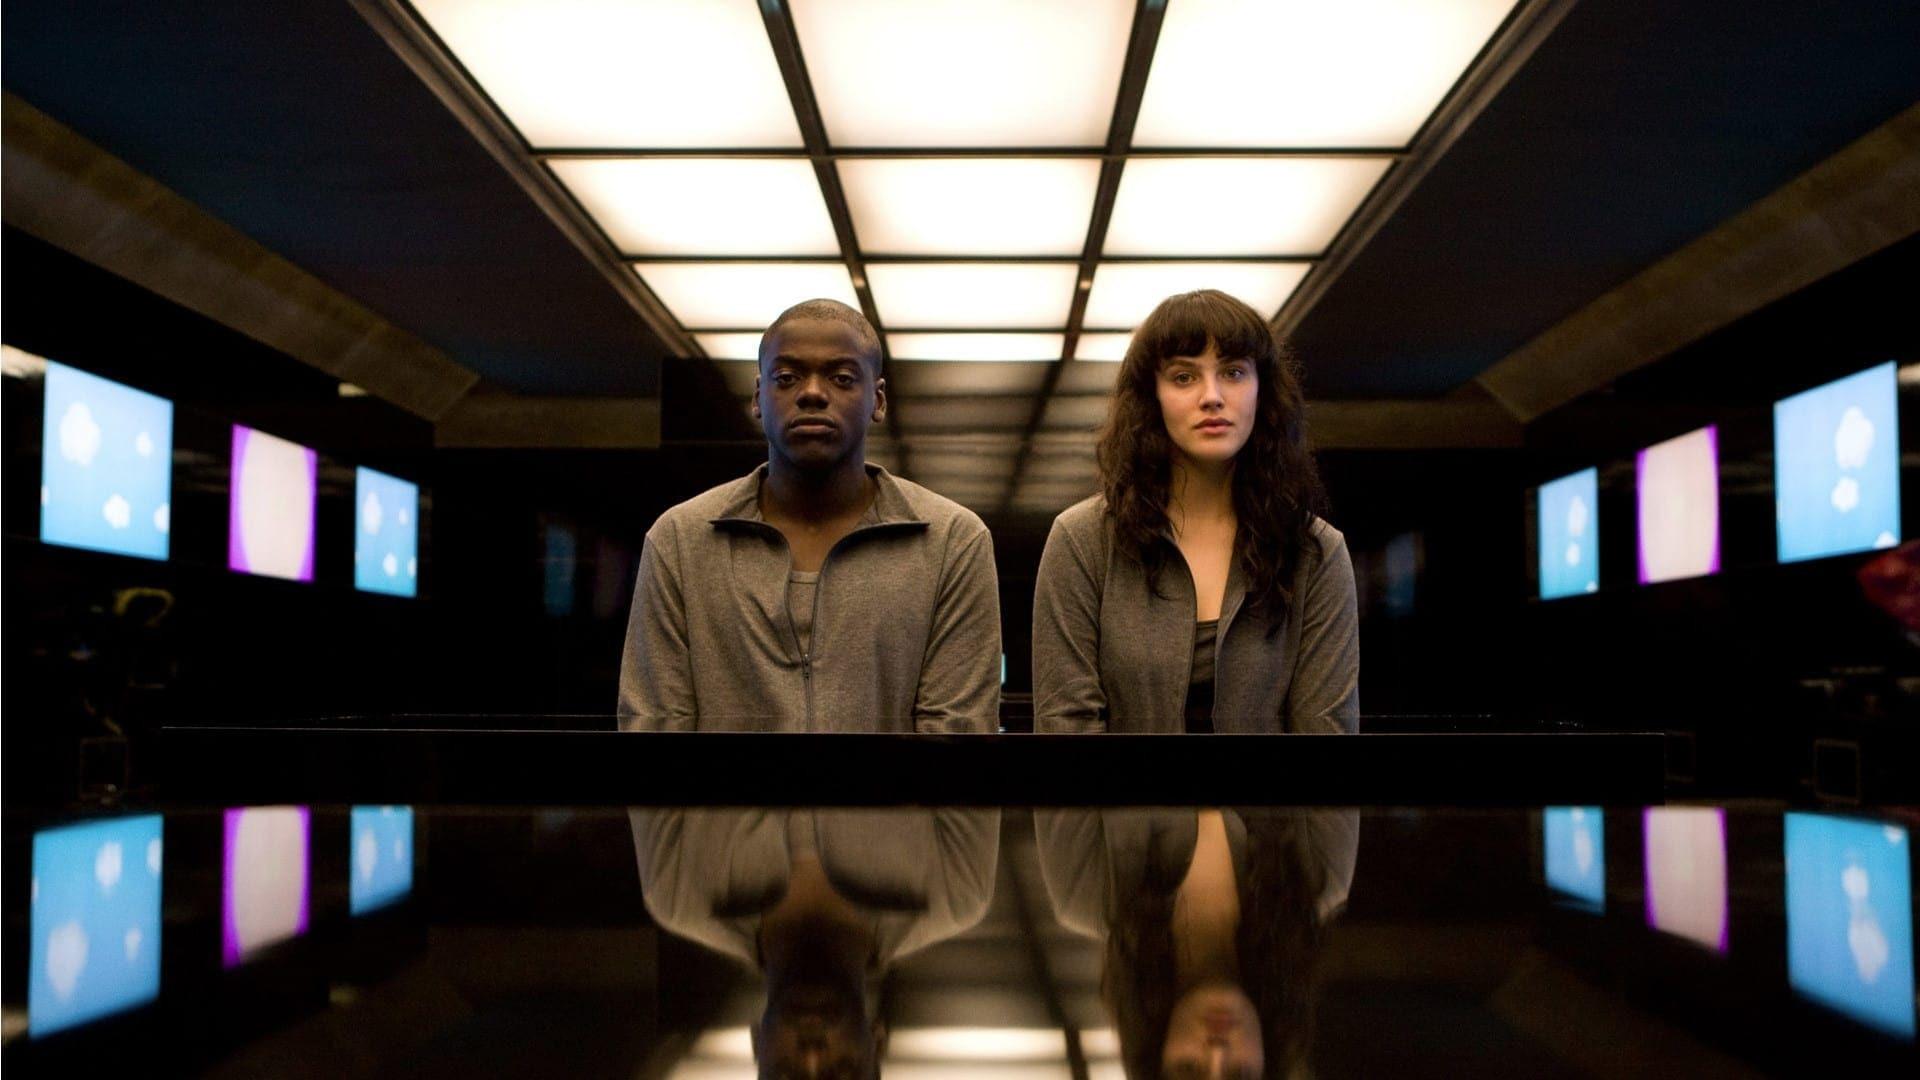 Кадры из фильма Черное зеркало Black Mirror 2011